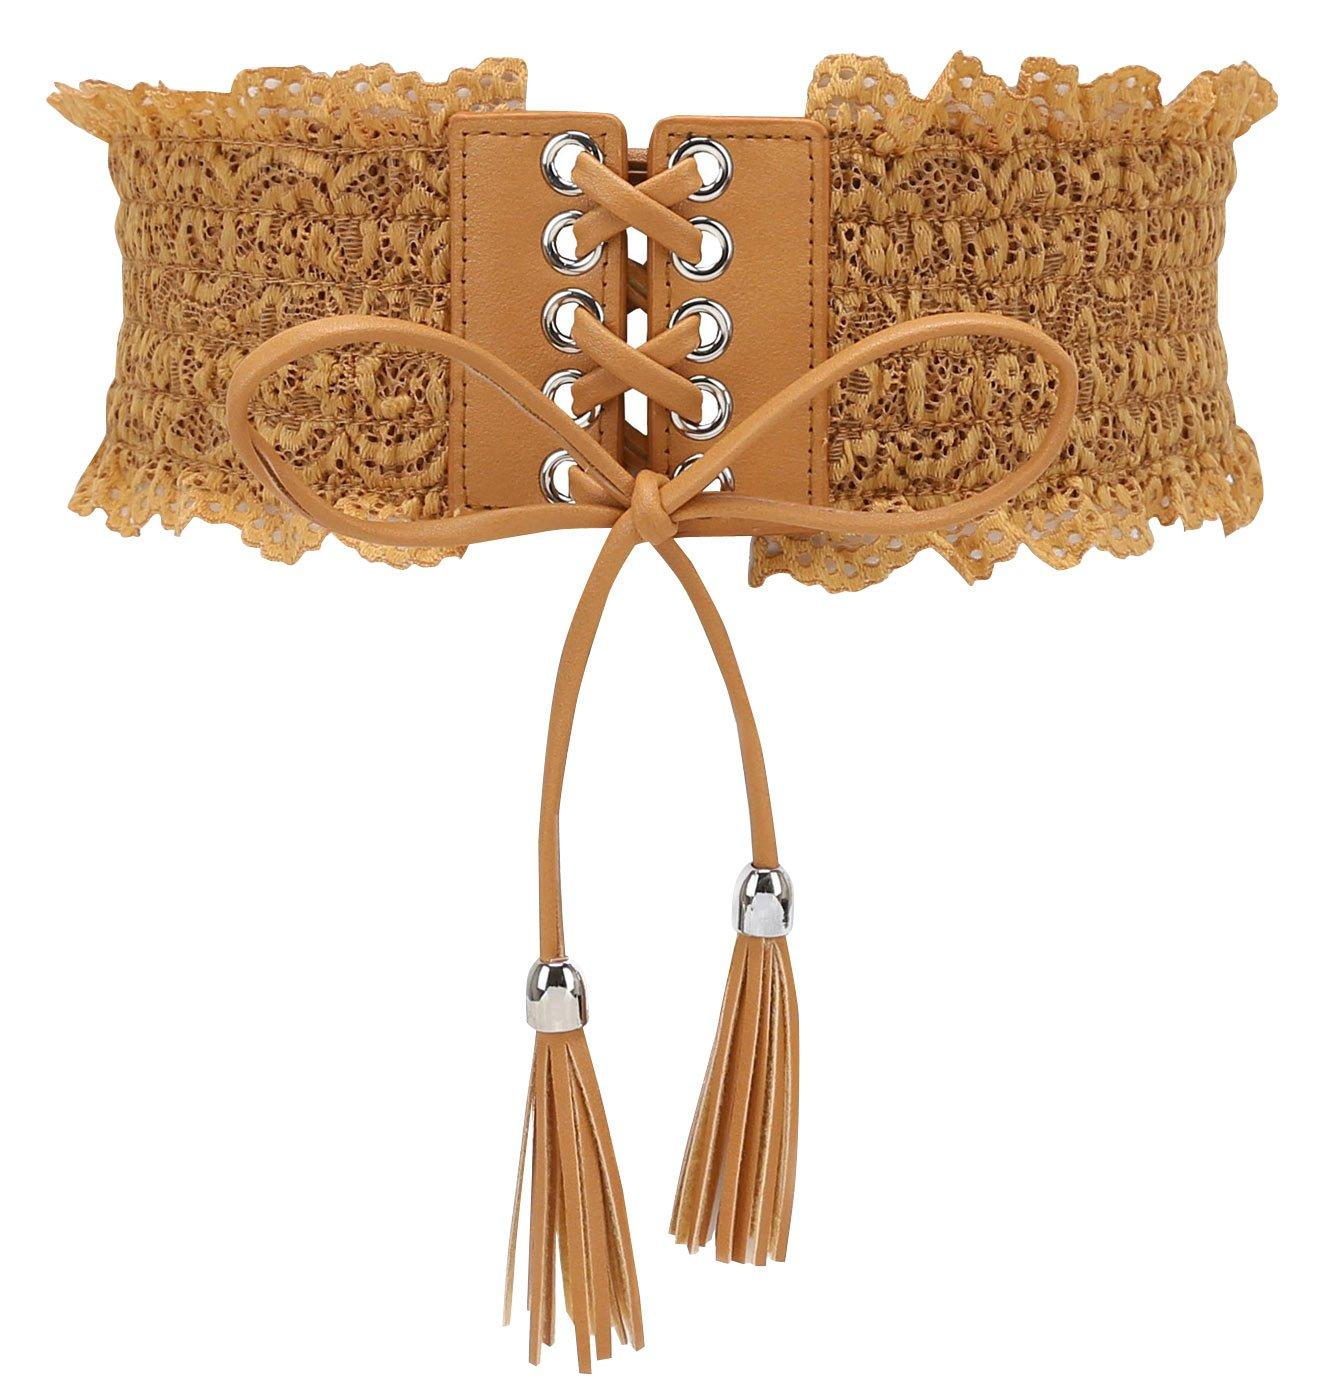 FEOYA Women's Bowknot Plus Size Obi Cinch Waist Band Wrap Aroud Lace Boho Sash Belt for Dress/Shirts/Skirts, Light Tan, M